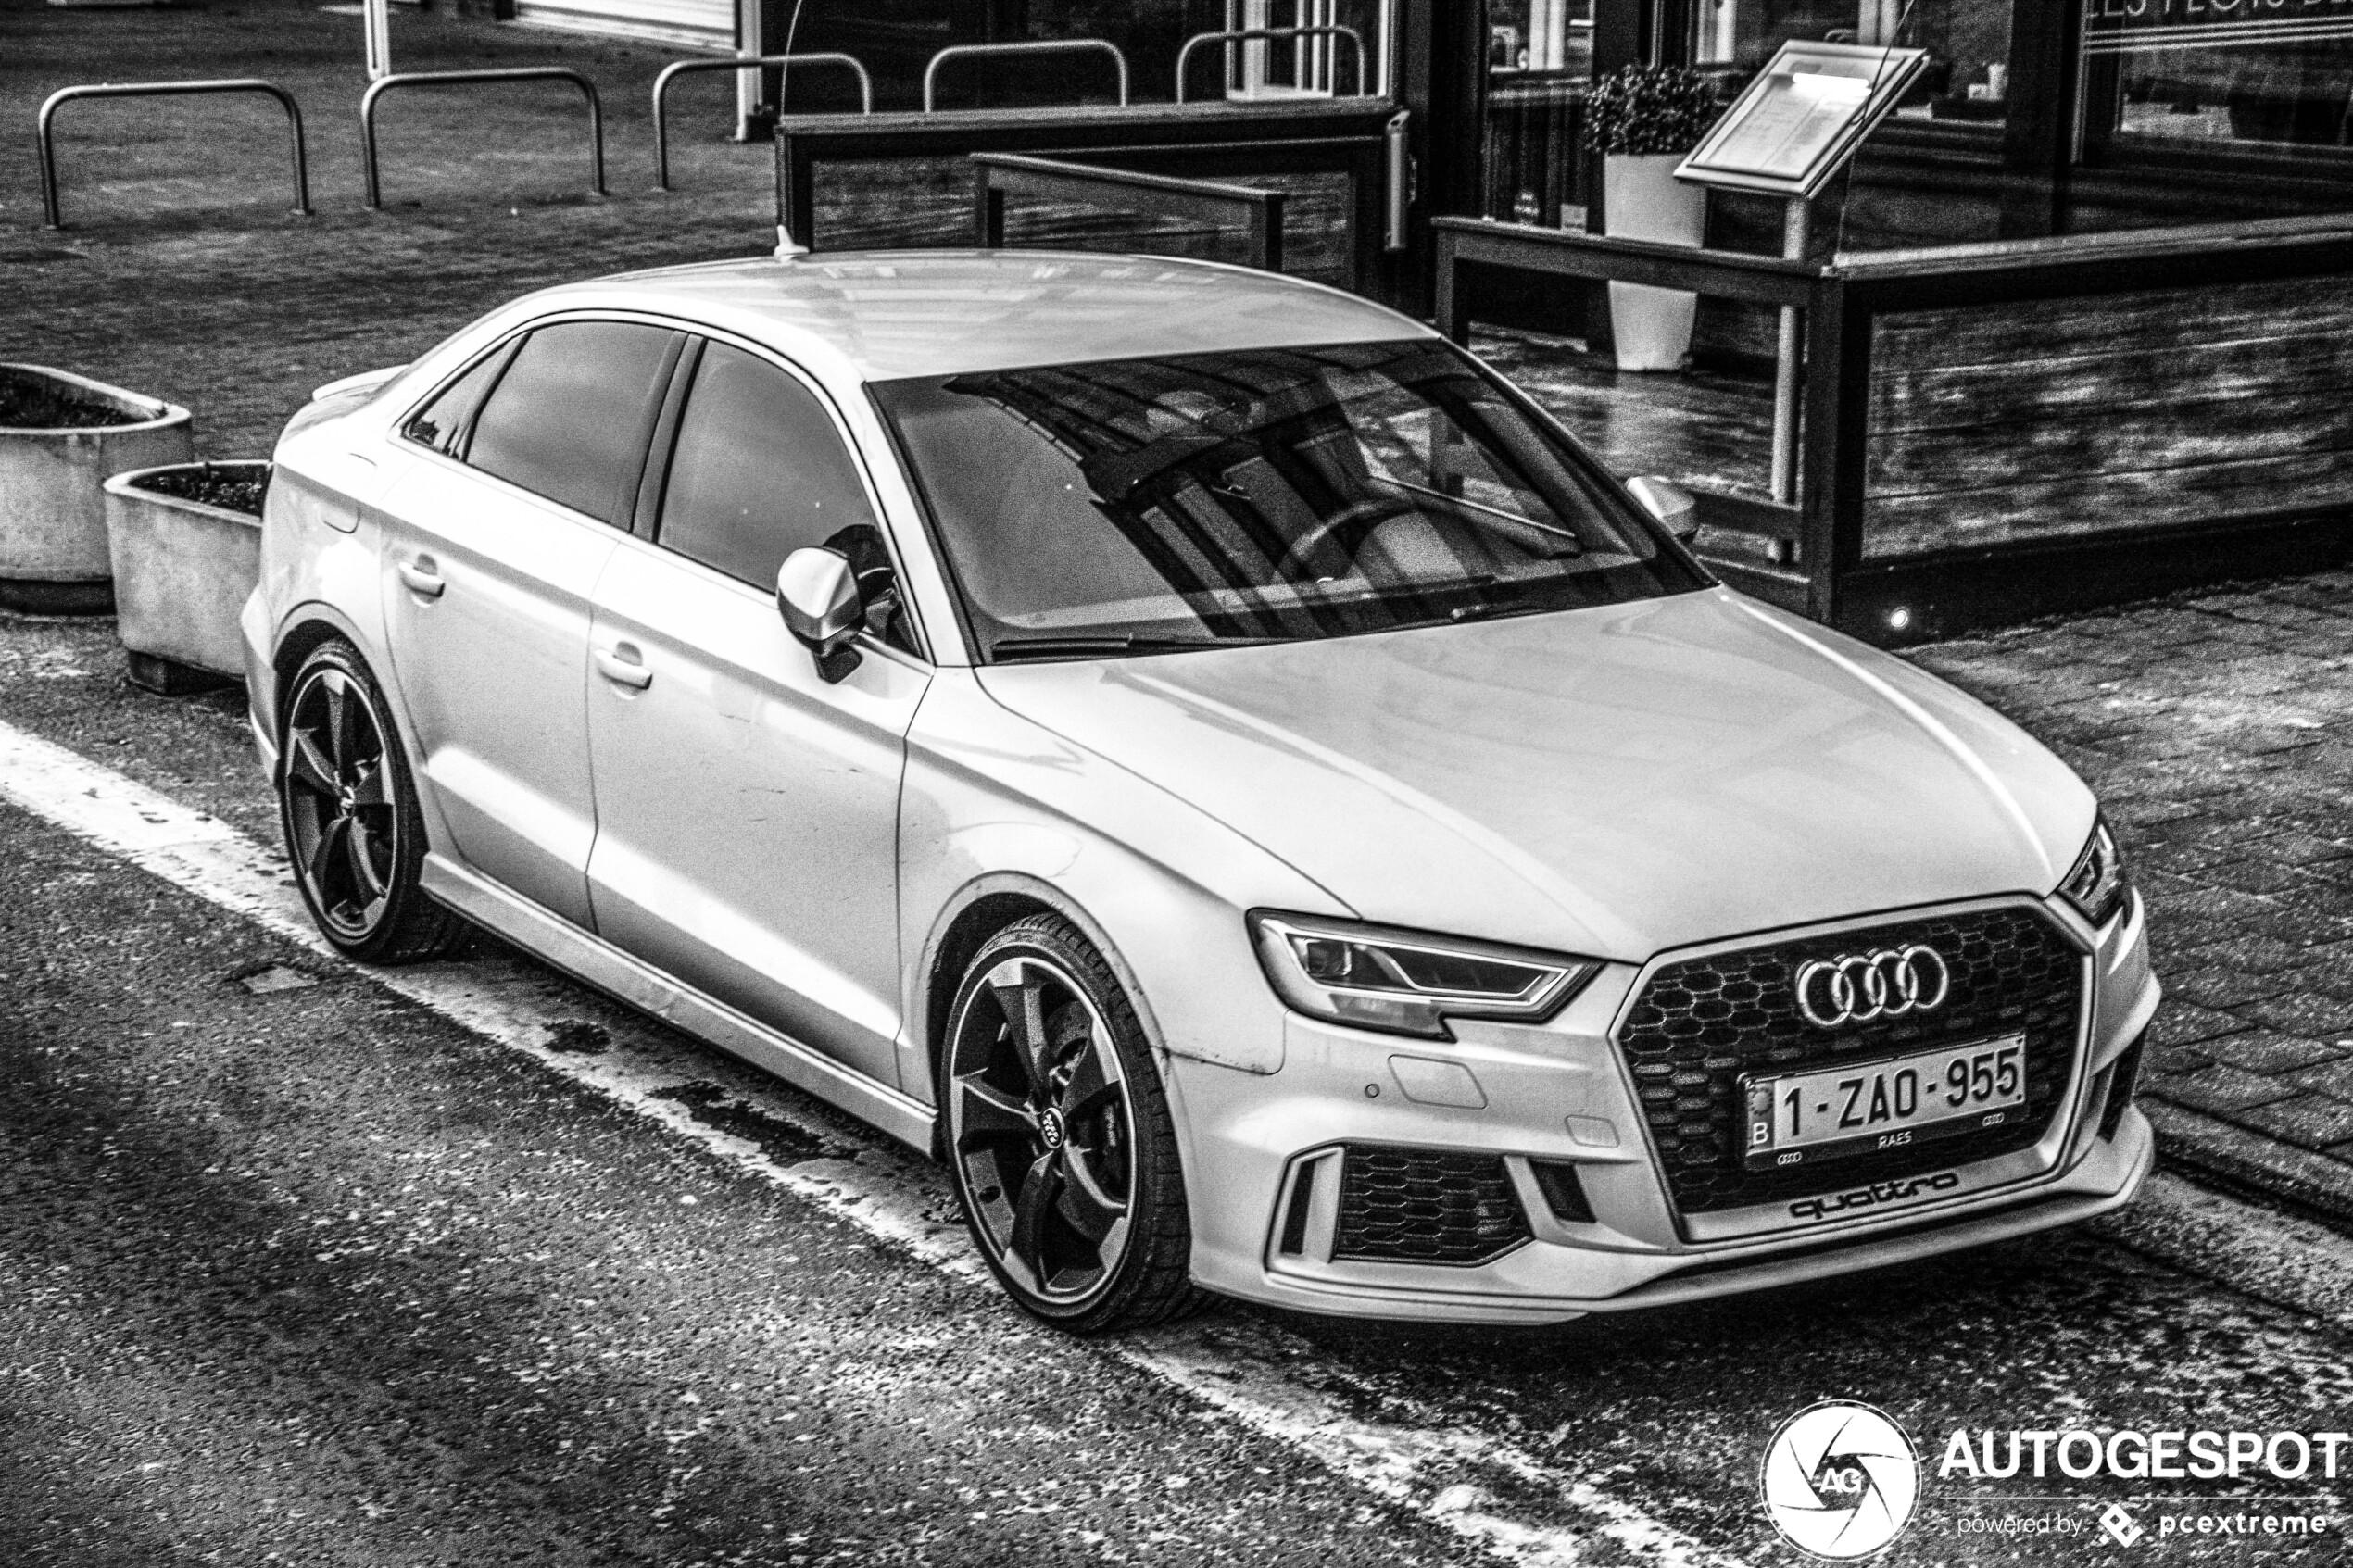 Audi Rs3 Sedan 8v 28 January 2020 Autogespot